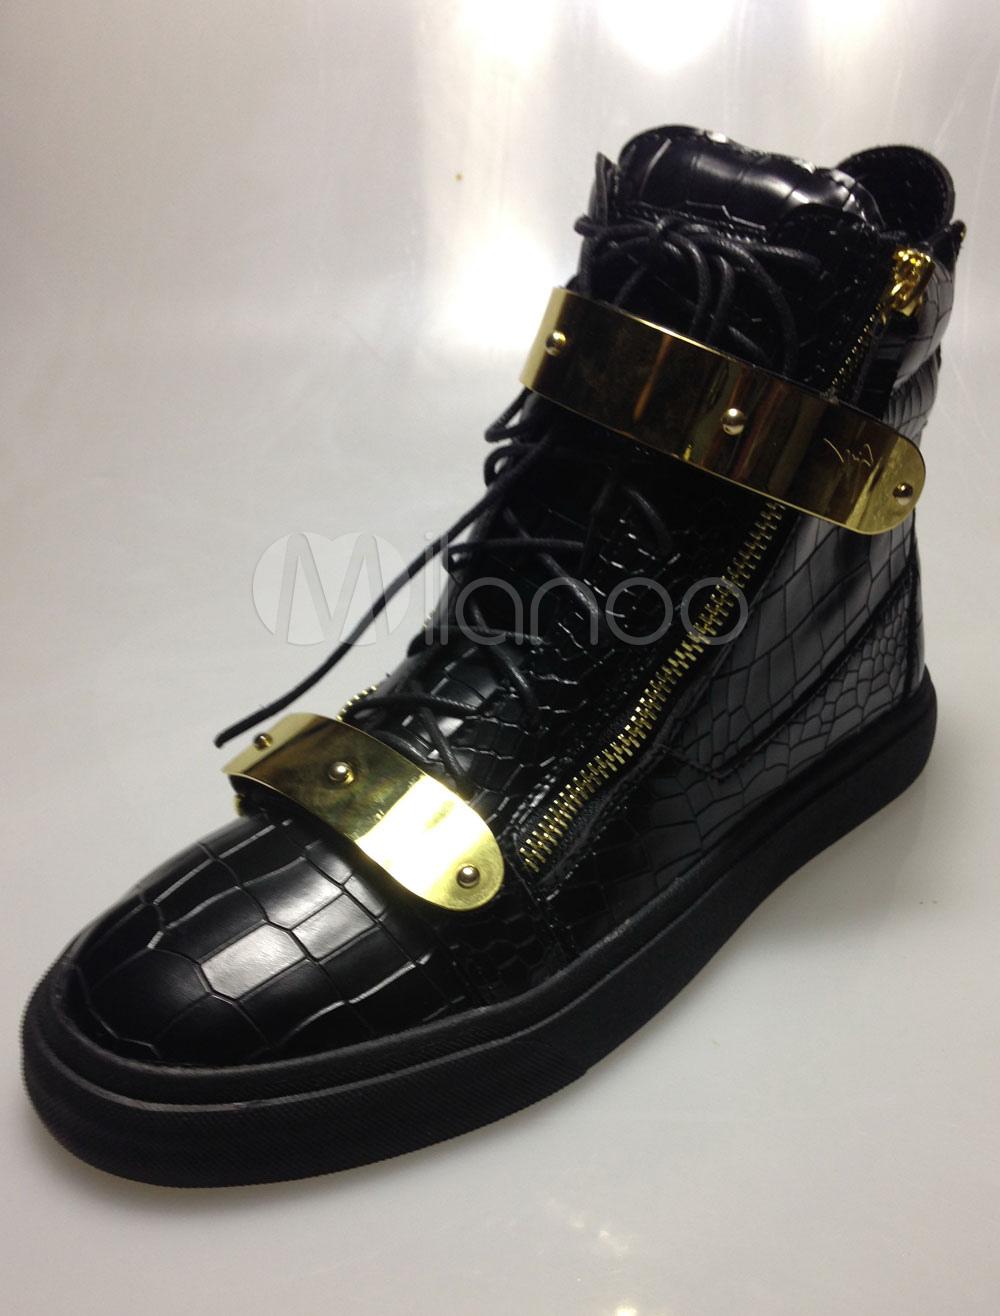 Black Metal Details Leather Zipper Sneakers For Men thumbnail